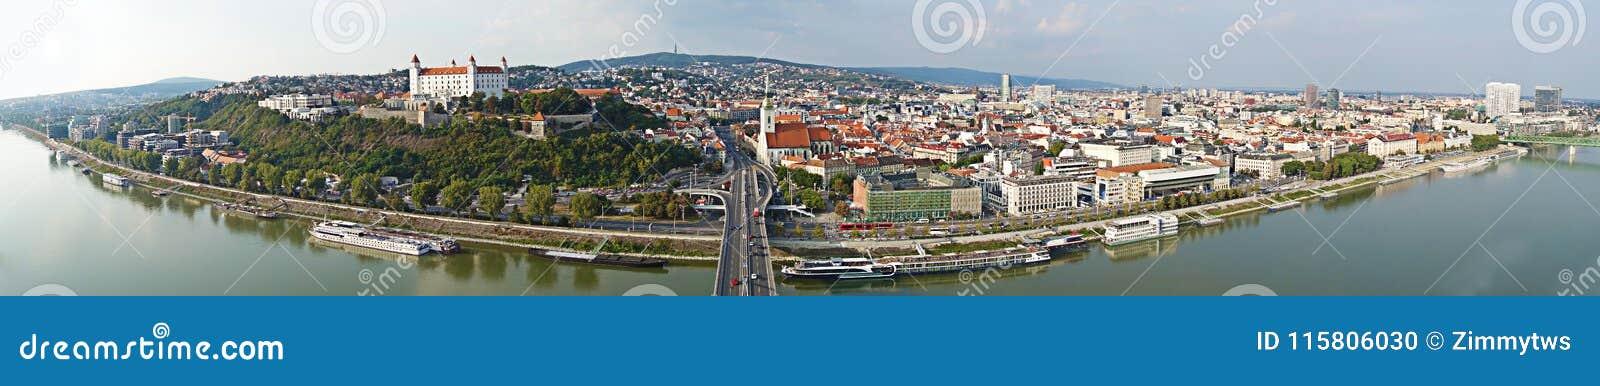 1bd555a39 Bratislava Slovakia Panorama Stock Photo - Image of travel, danube ...